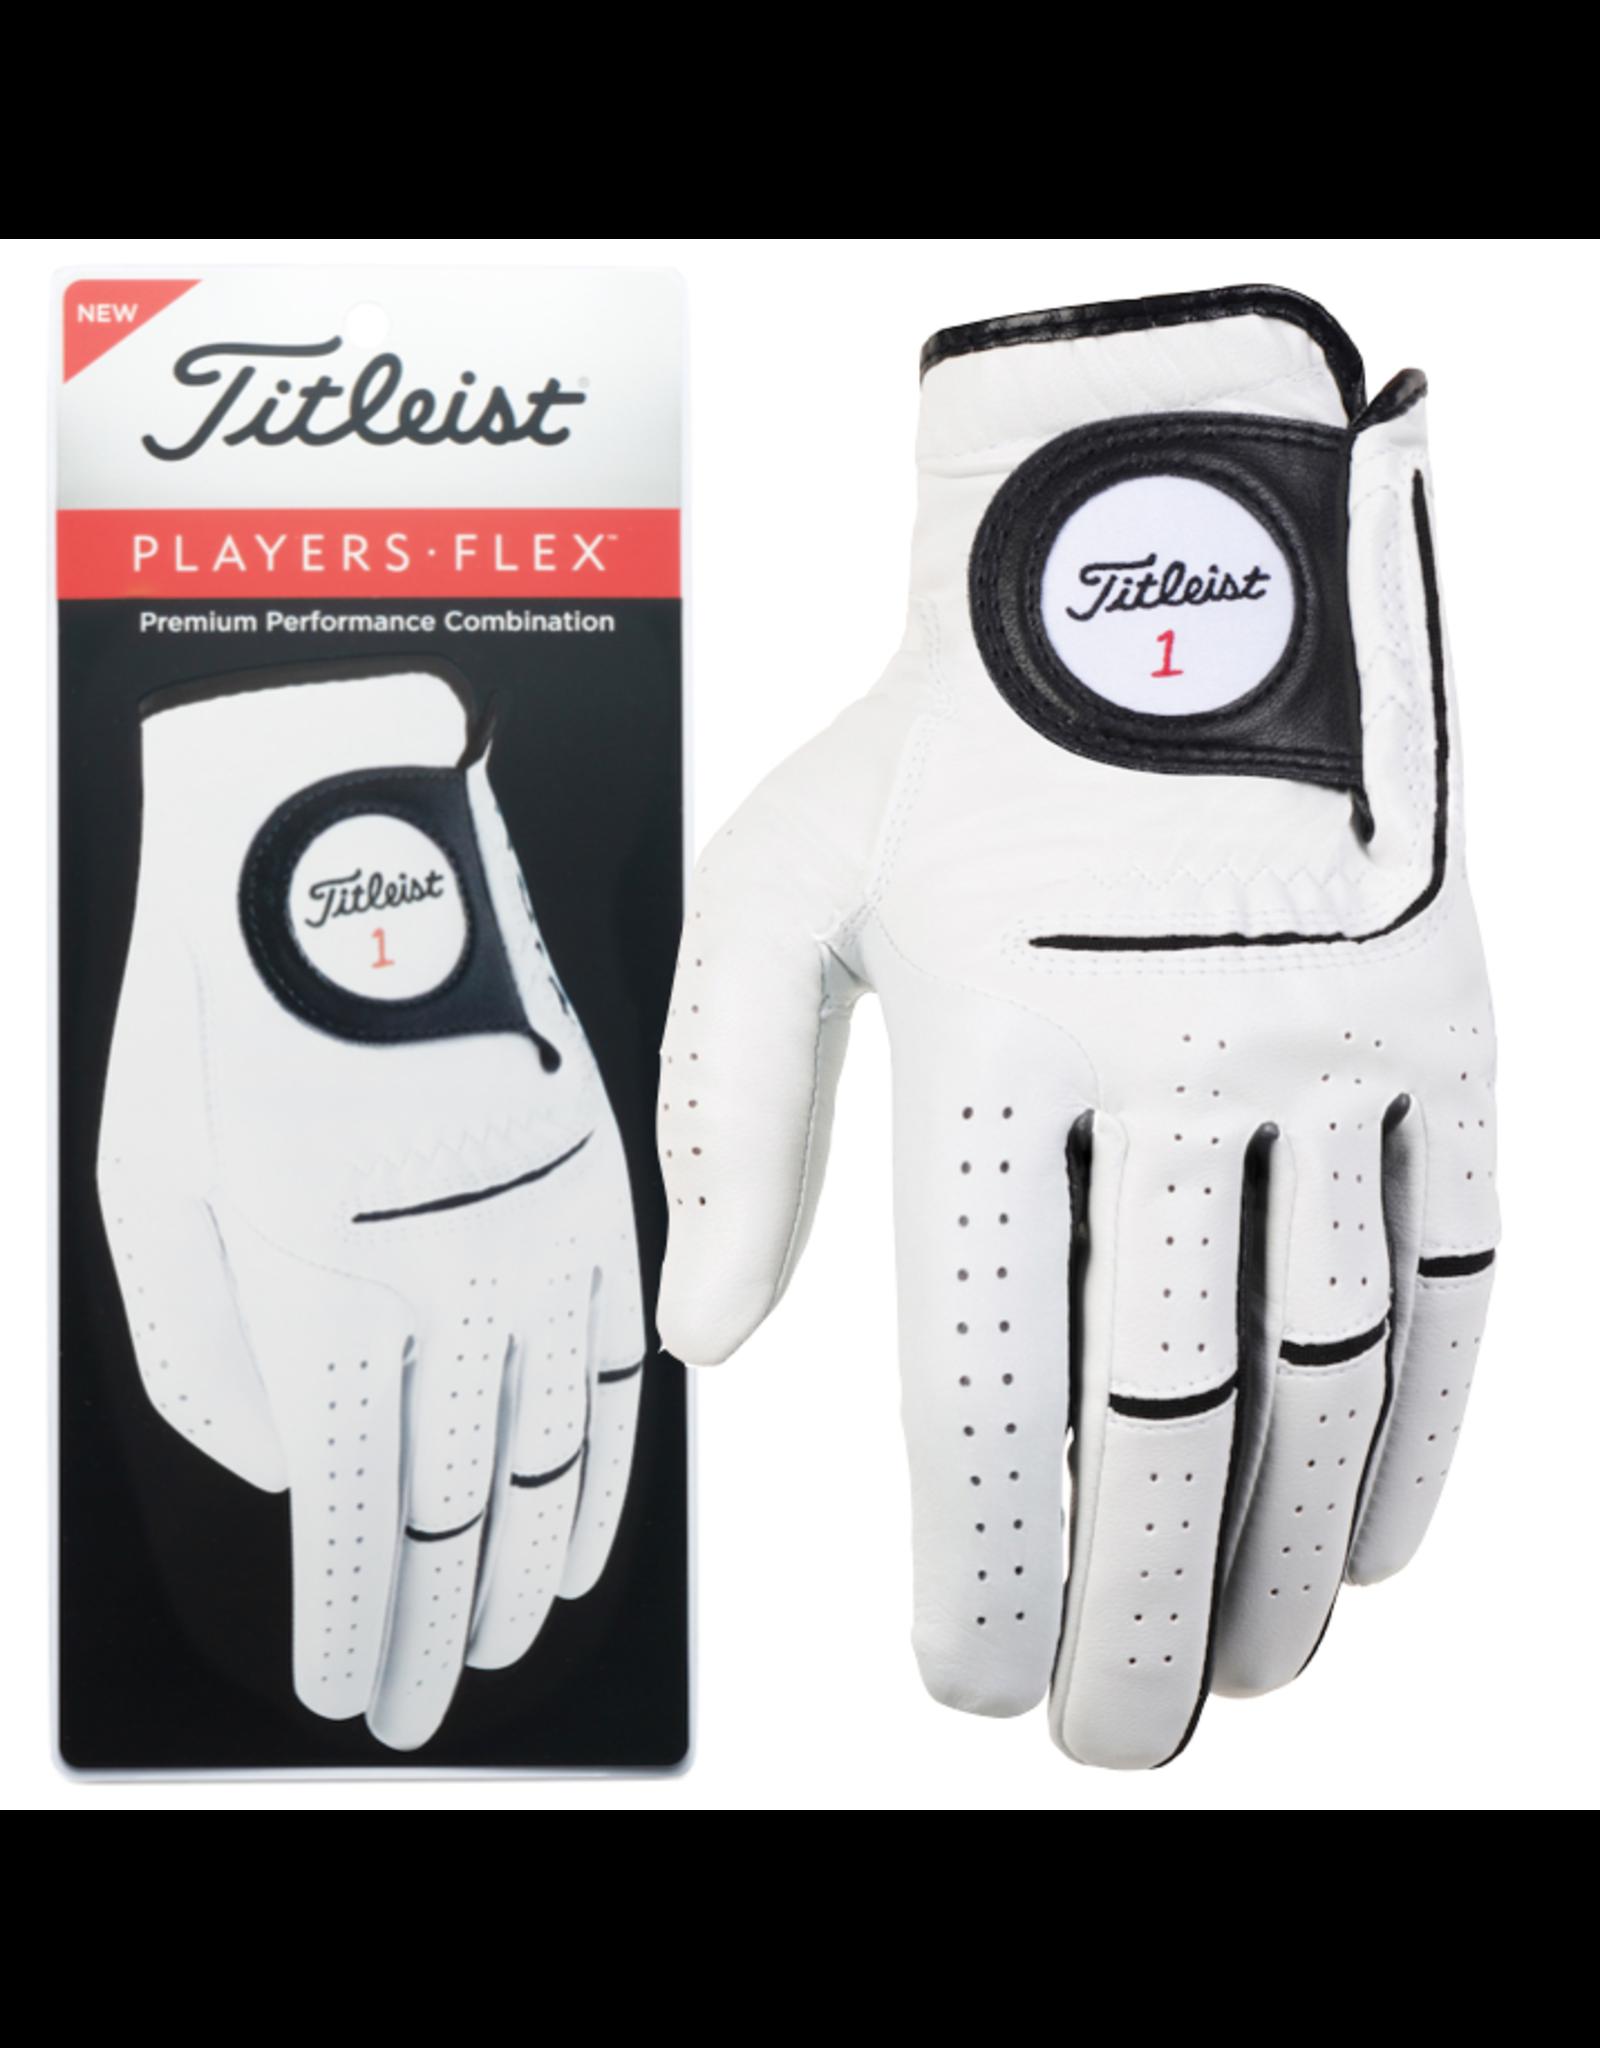 Titleist Titleist Players Flex Glove